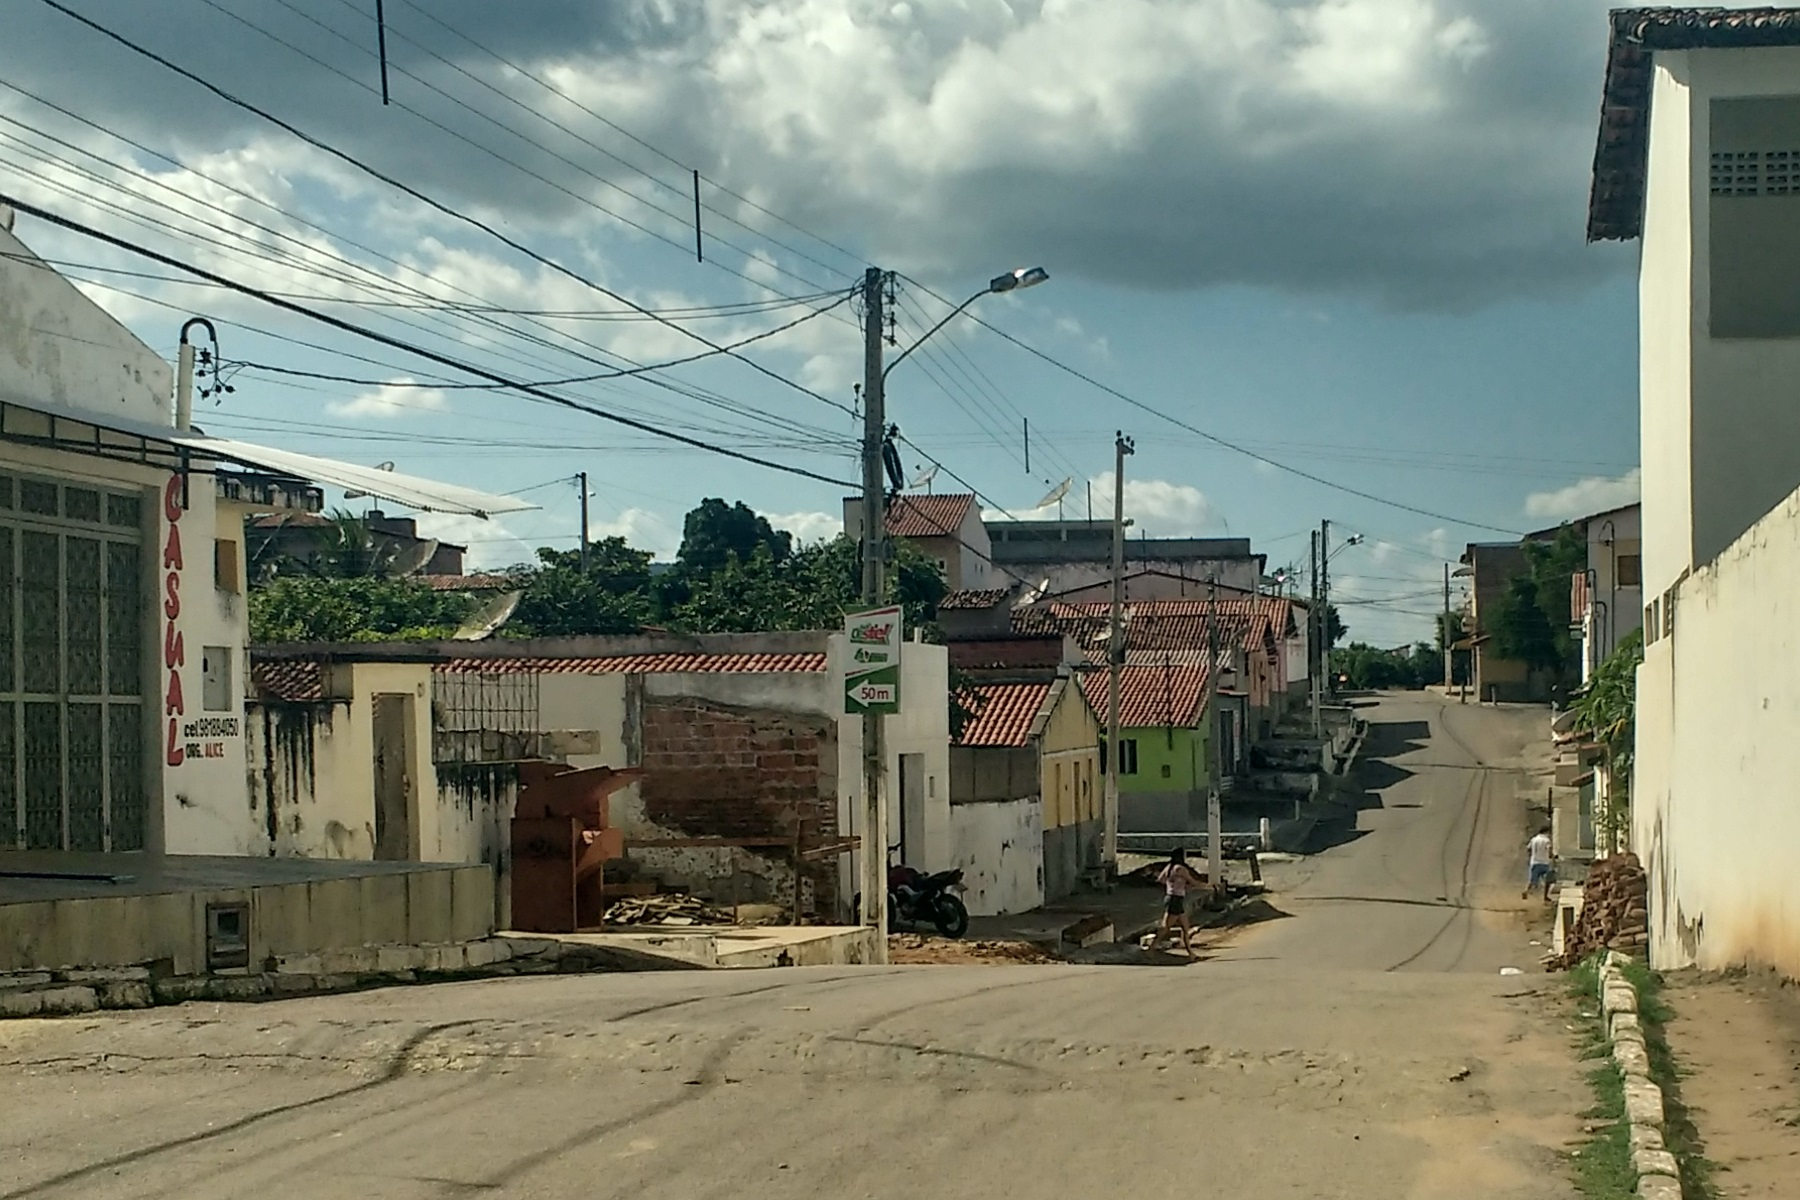 Doutor Severiano Rio Grande do Norte fonte: upload.wikimedia.org